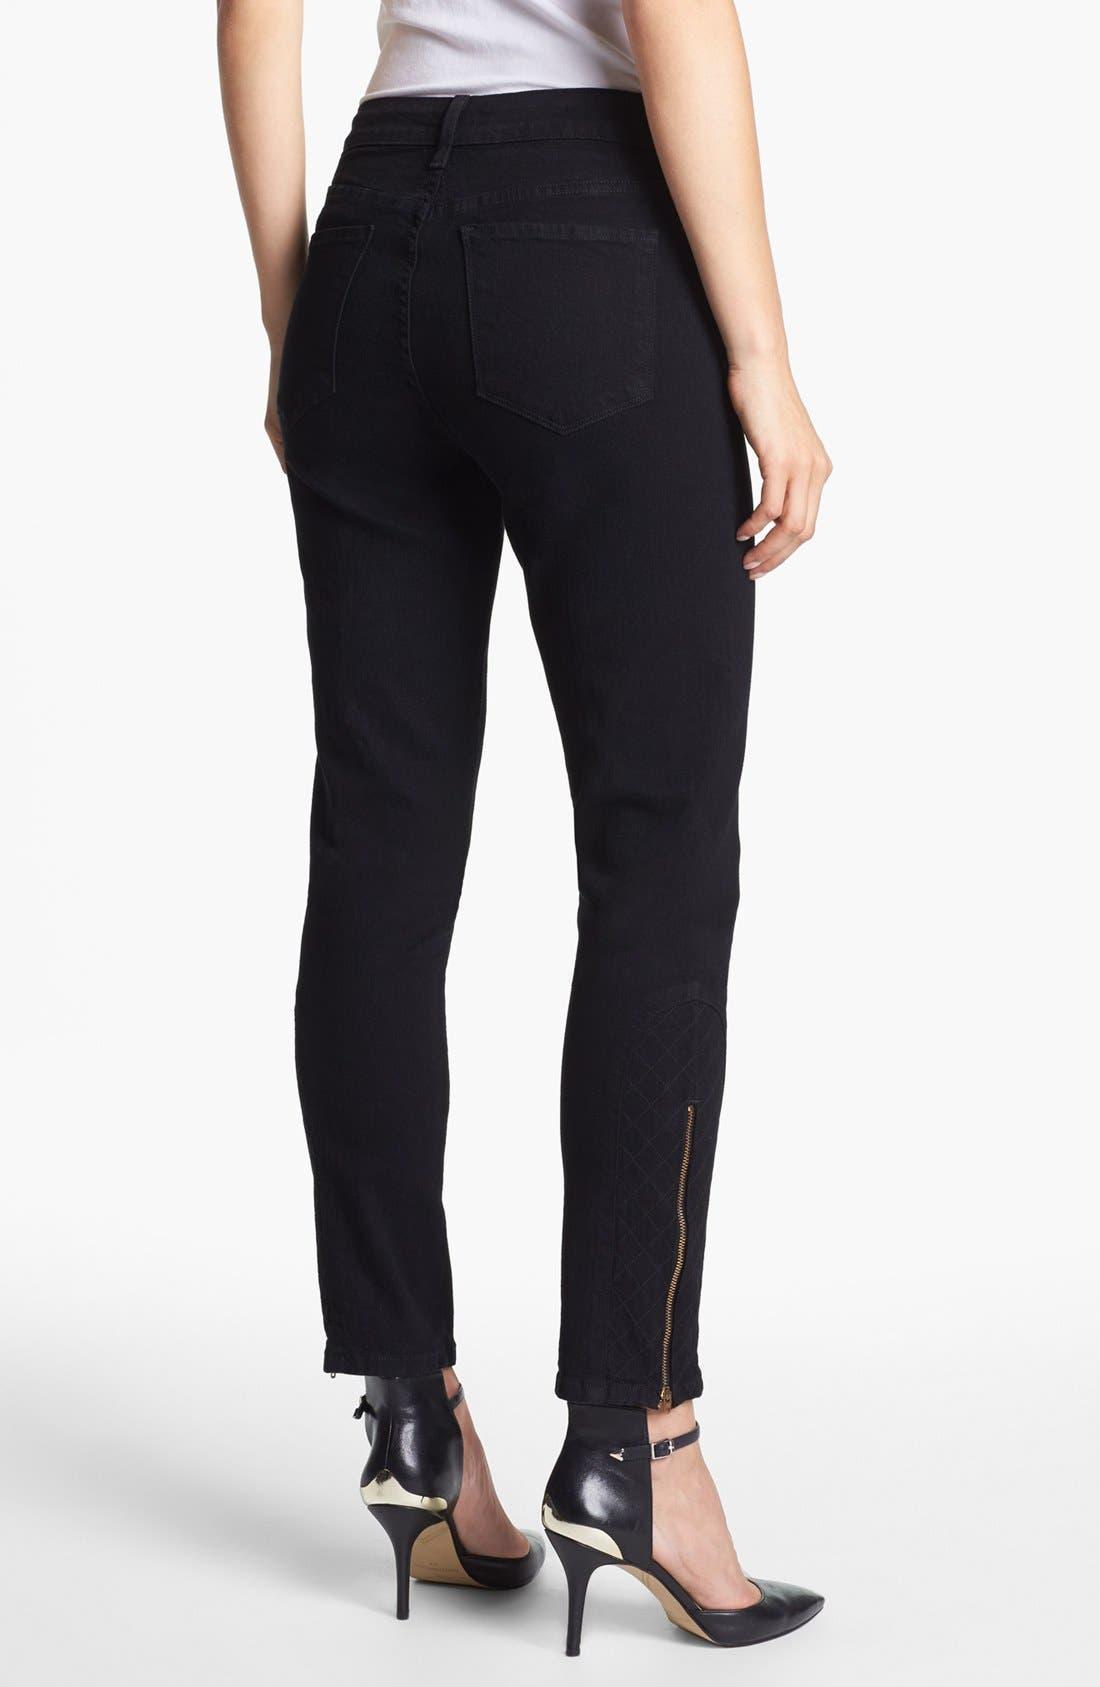 Alternate Image 2  - NYDJ 'Arabella' Ankle Zip Stretch Skinny Jeans